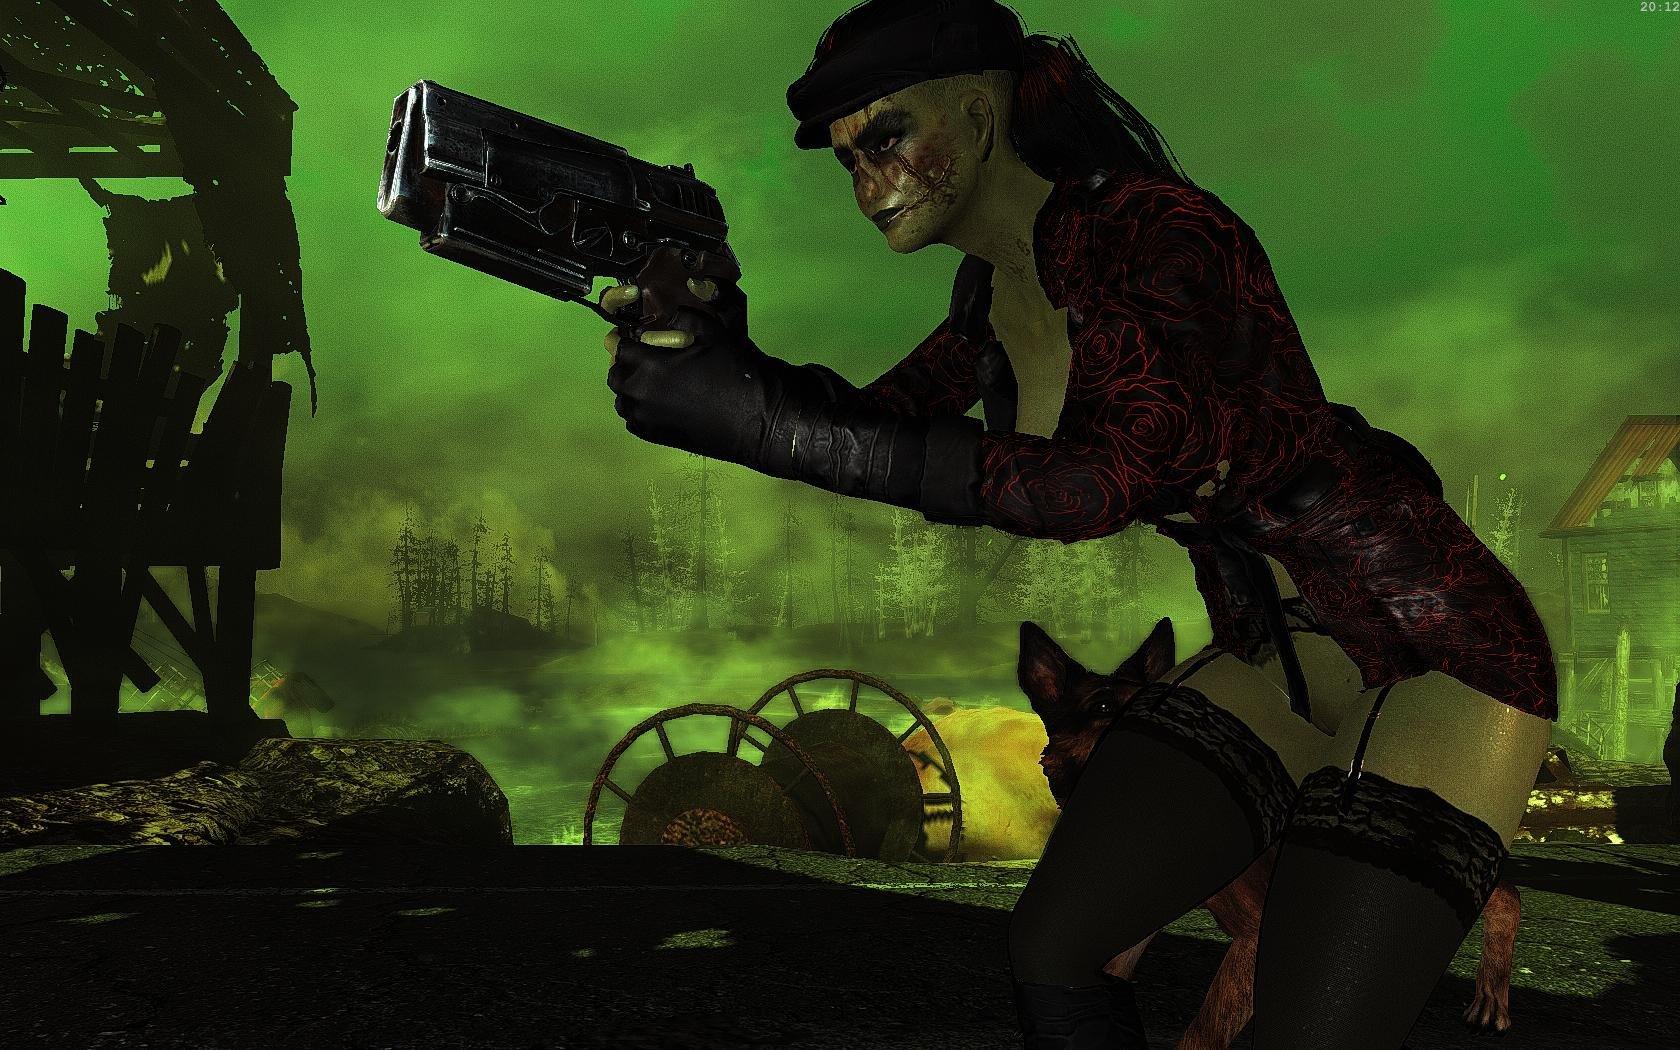 Fallout4 2019-05-30 20-12-35-22